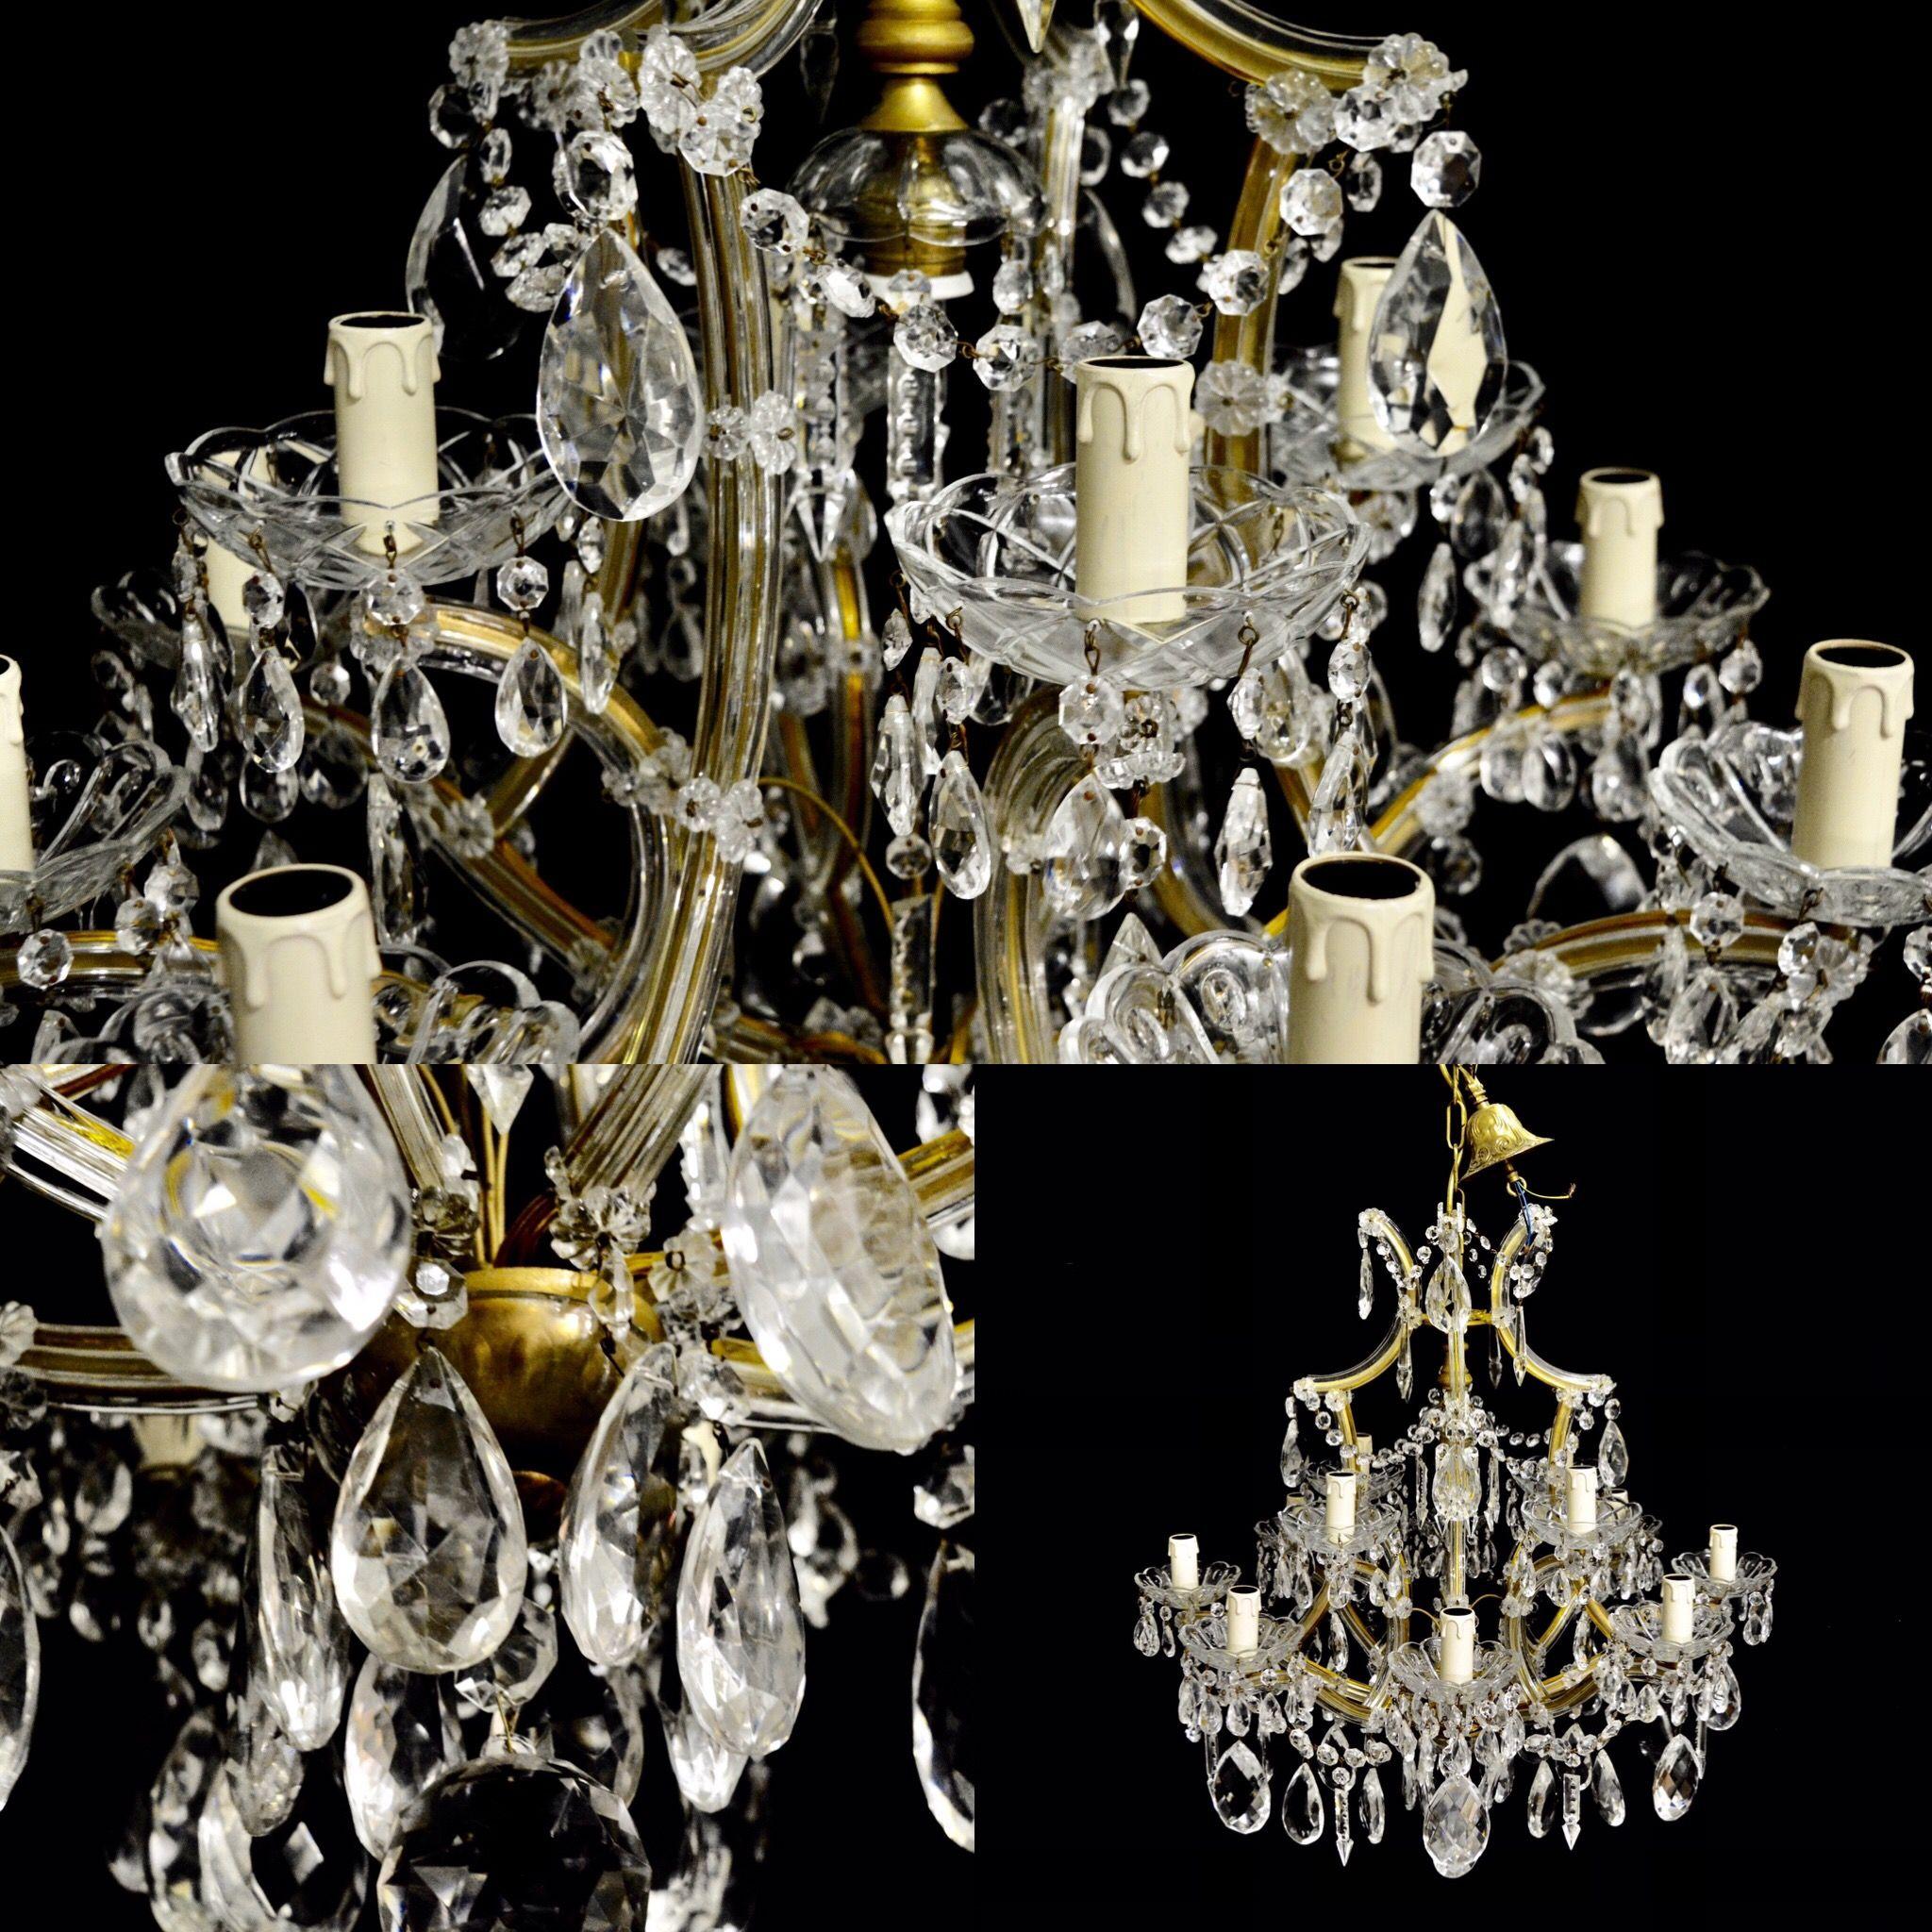 deco early sale italian chandeliers vintage salelantern art murano for pin s chandelier antique grape century pendant lantern glass